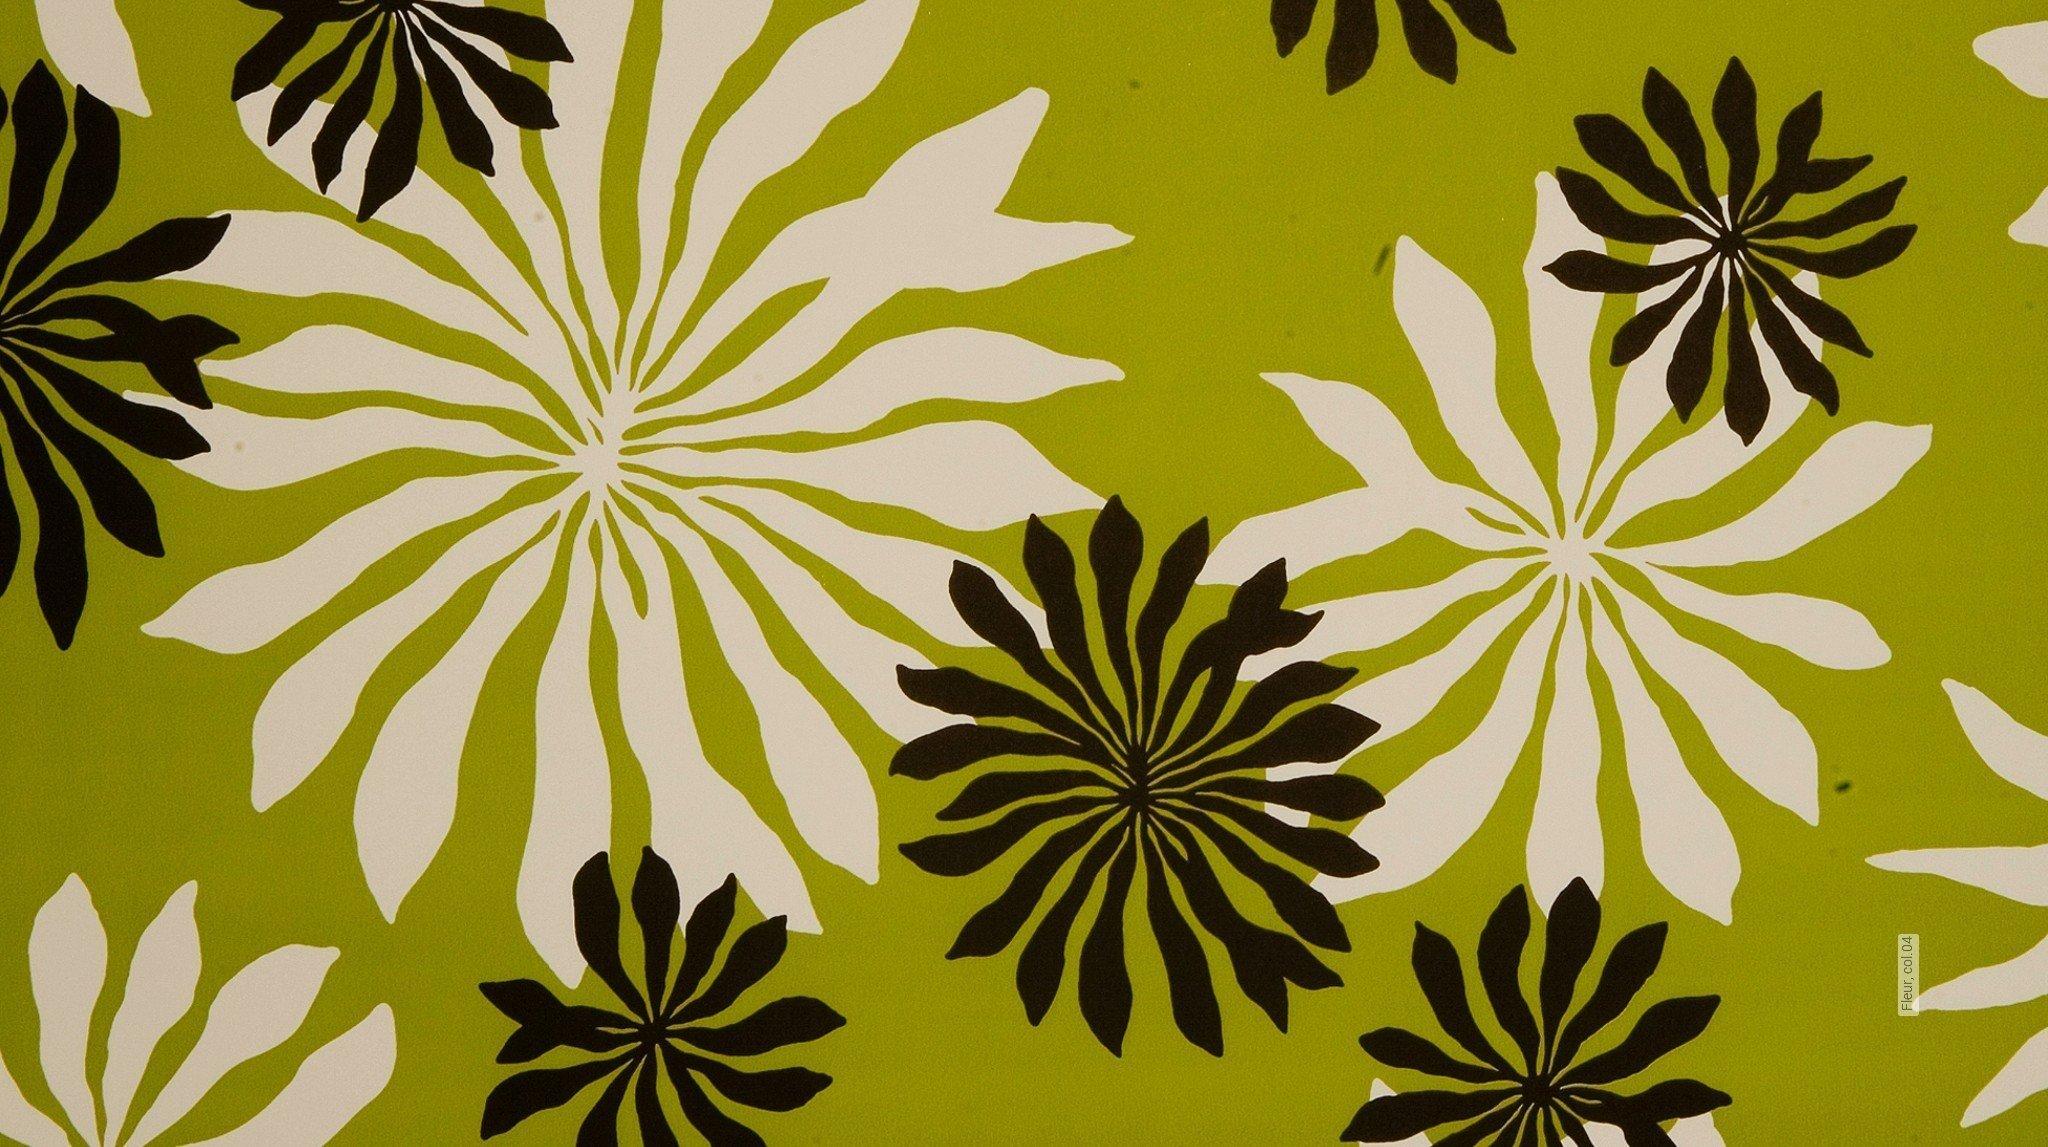 florale muster gr n tapeten lust auf was neues. Black Bedroom Furniture Sets. Home Design Ideas